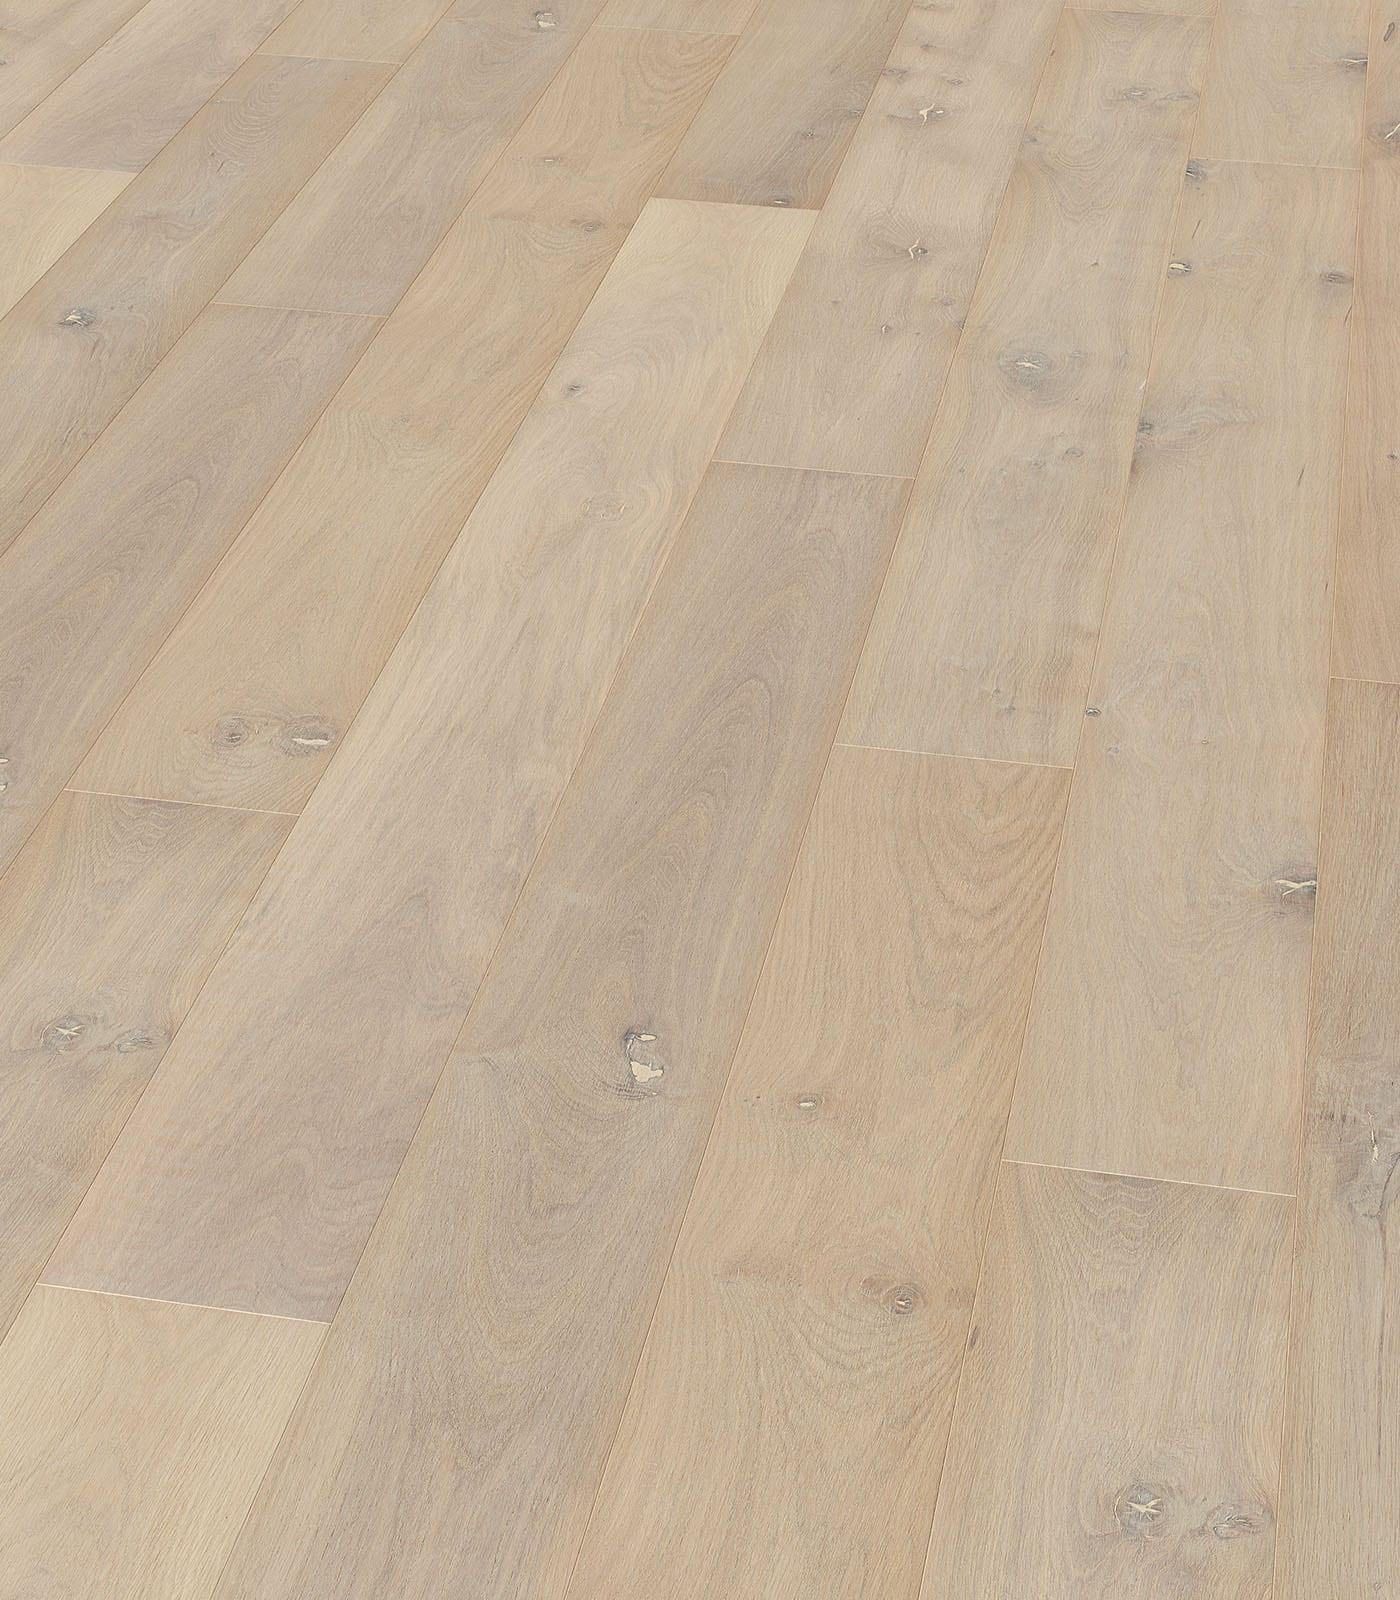 Aspen-Lifestyle Collection-European Oak Floors-angle